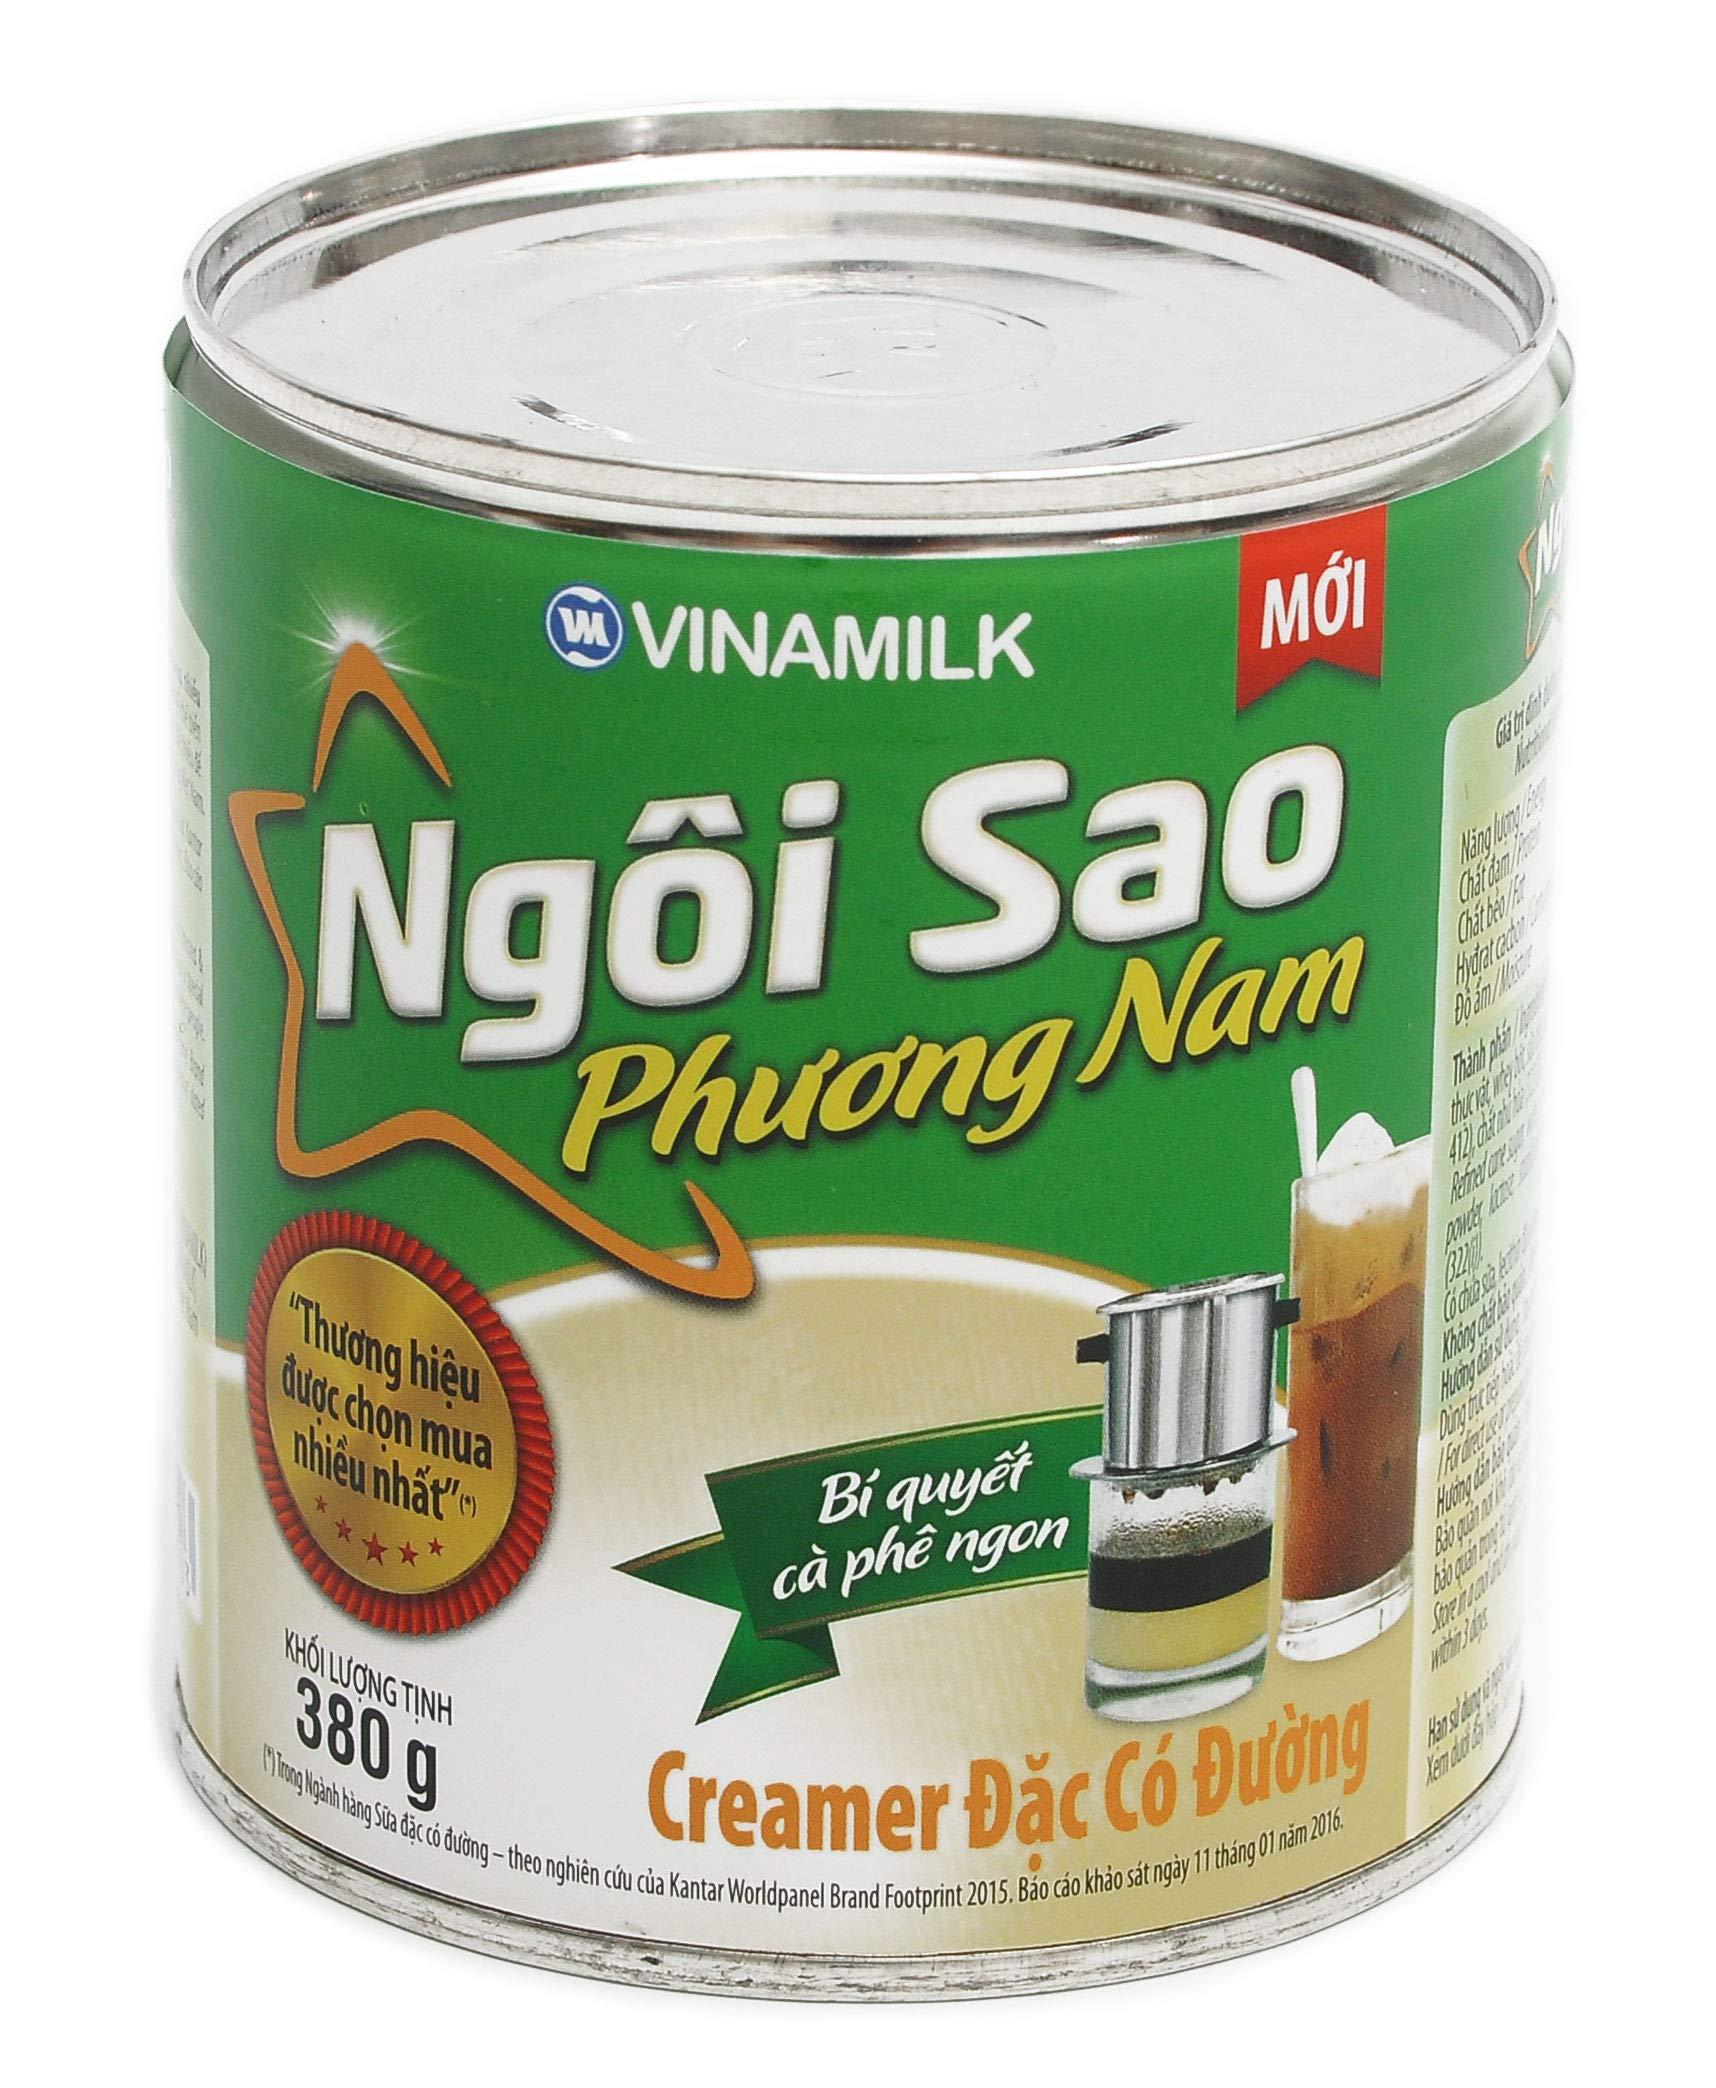 Vinamilk Vietnamese Southern Star Sweetened Condensed Creamer Milk 13.4 oz Can - Green